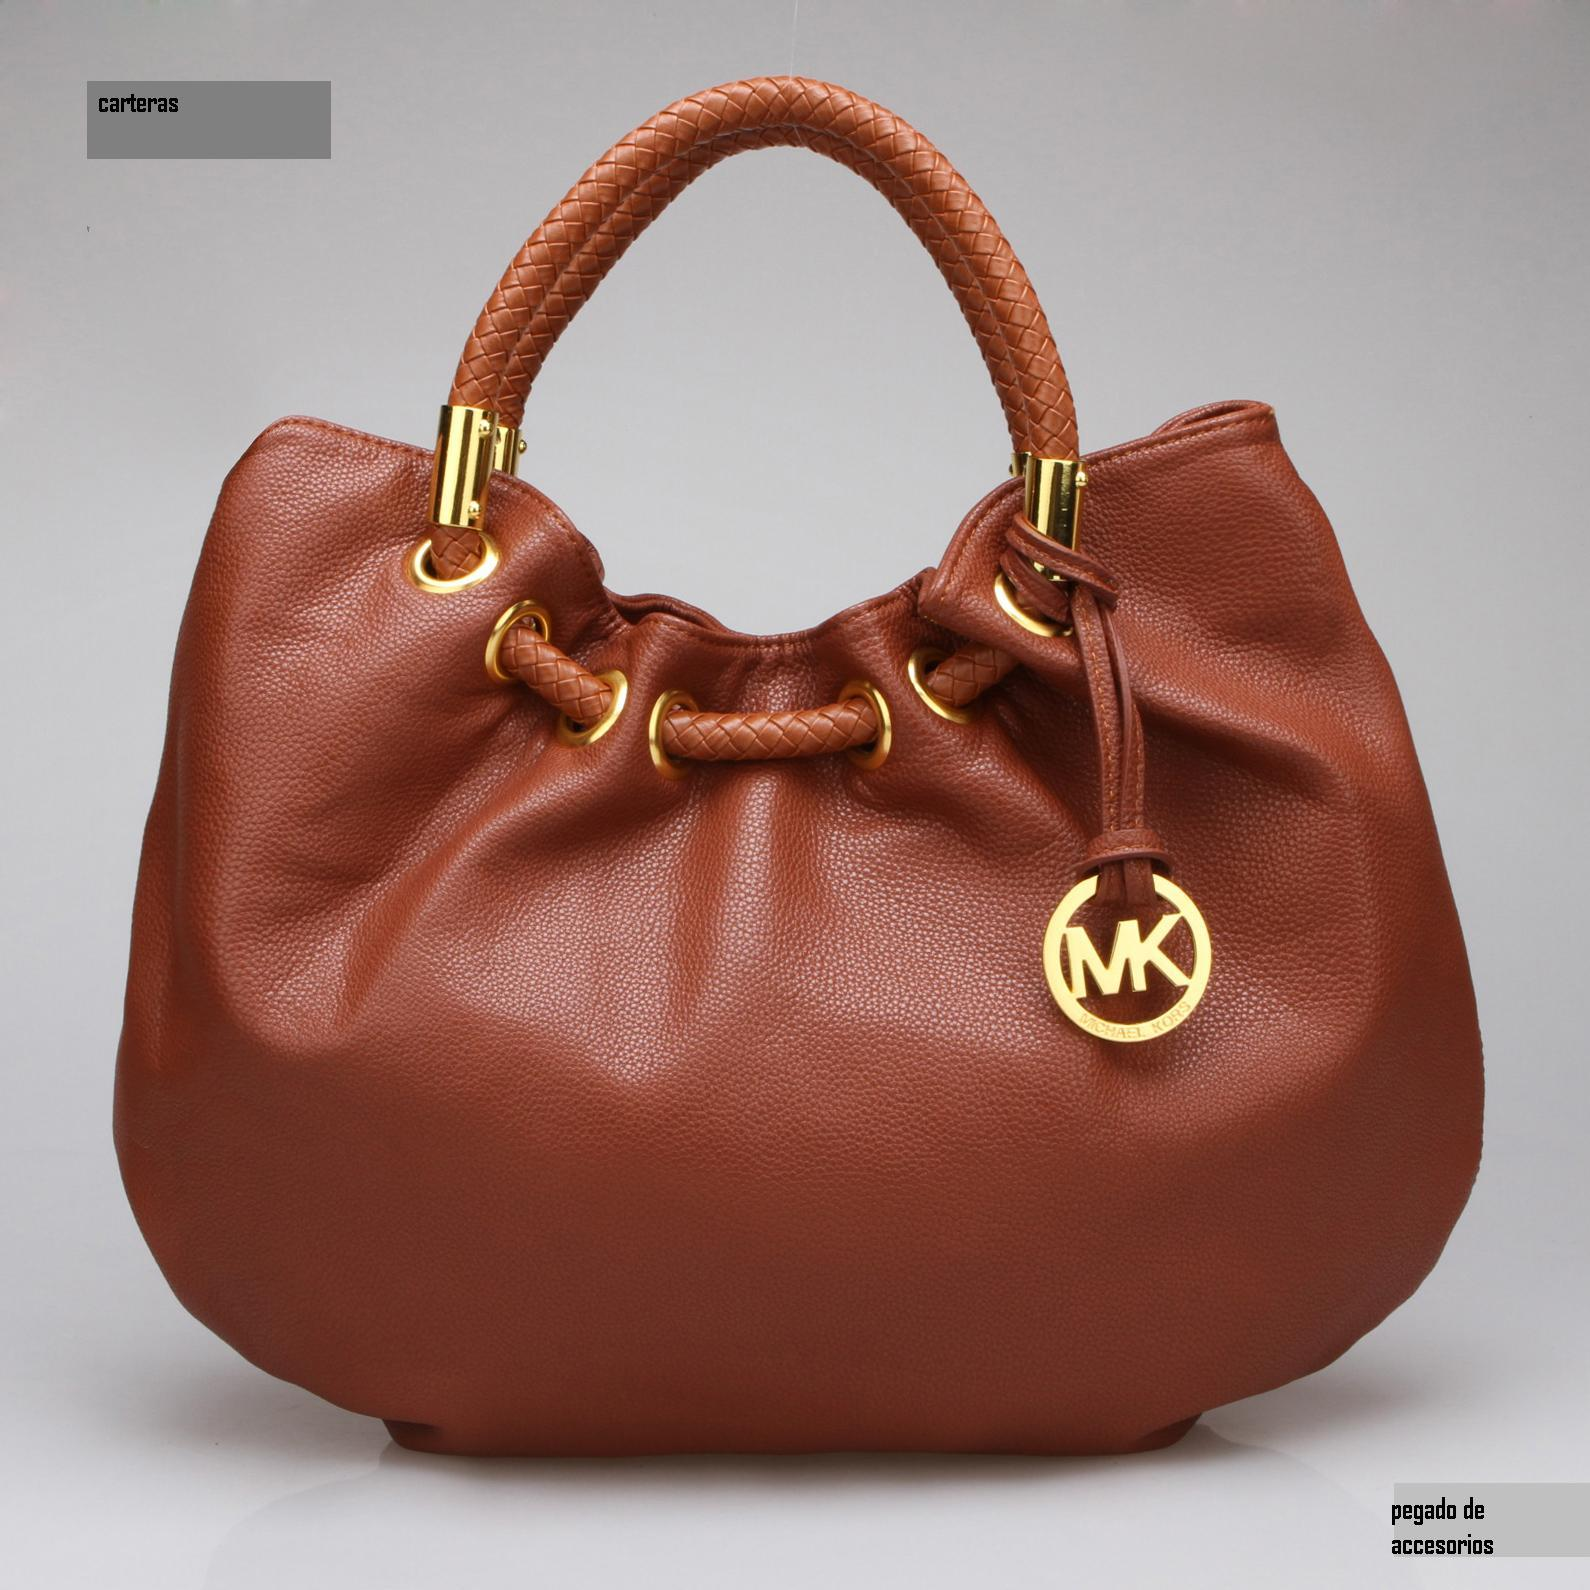 carteras de cuero repair purses bags suitcases and